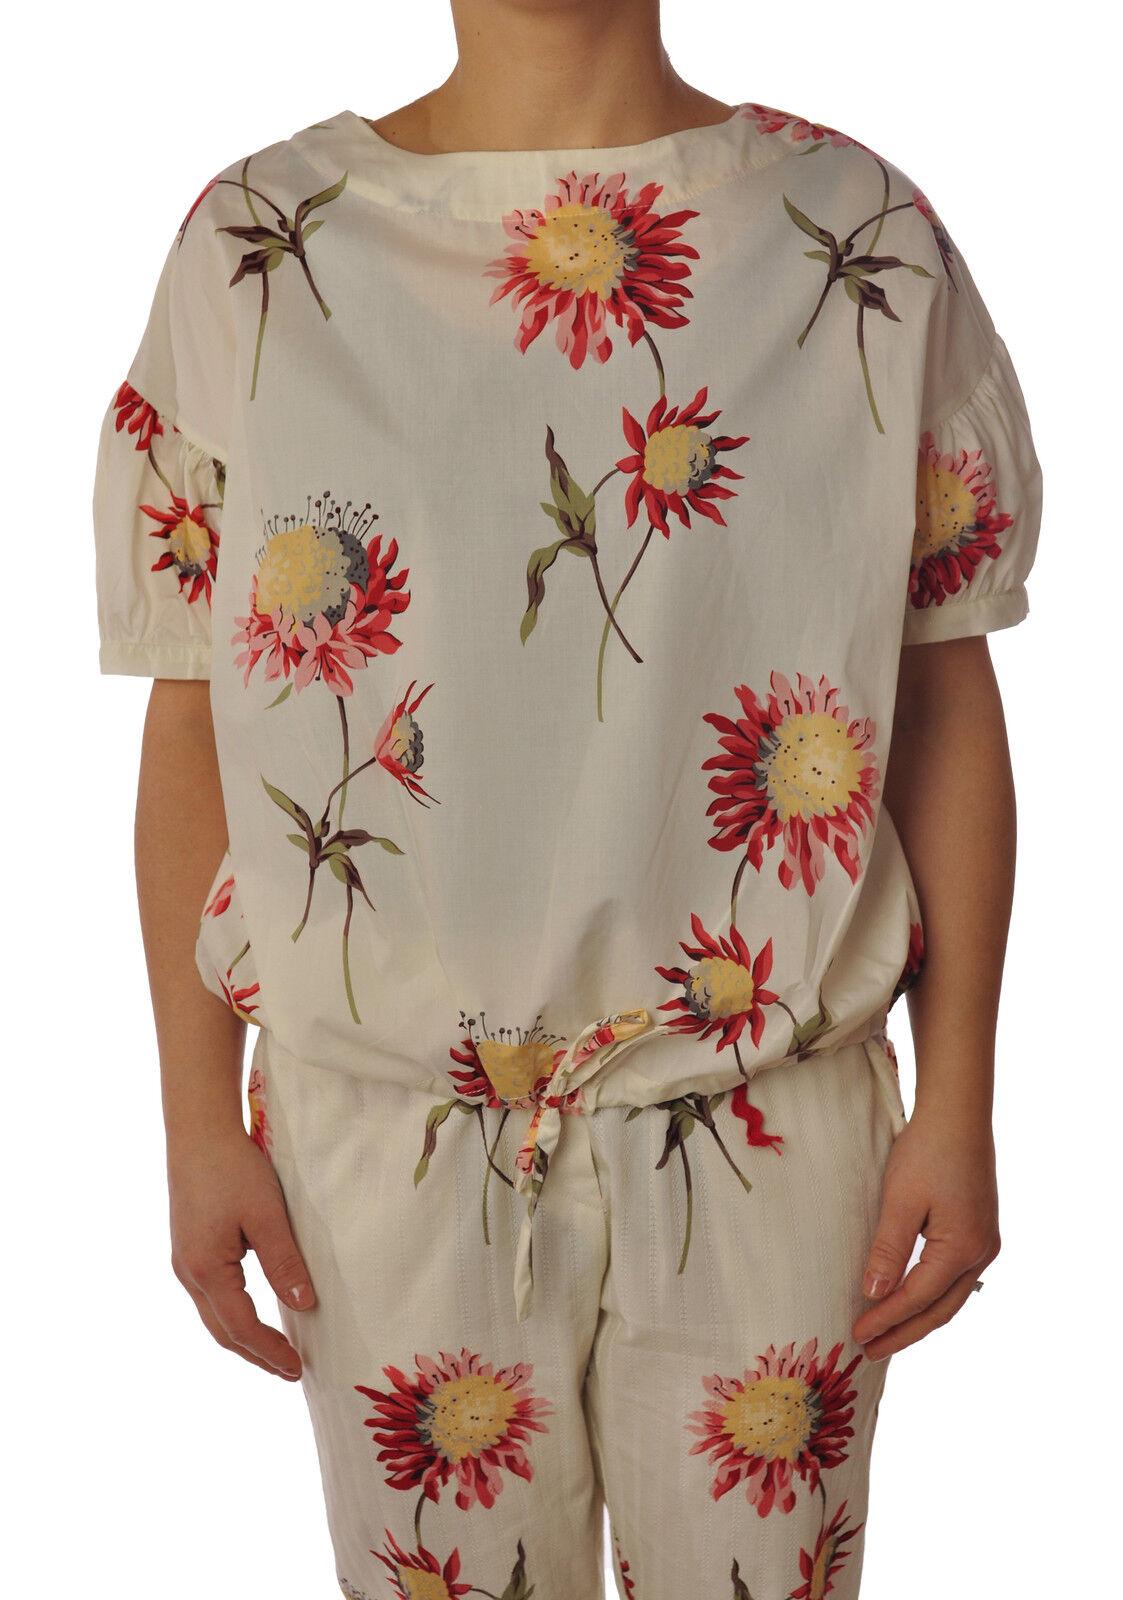 Ottod'ame - Shirts-Blouses - Woman - Fantasy - 3389208G184132